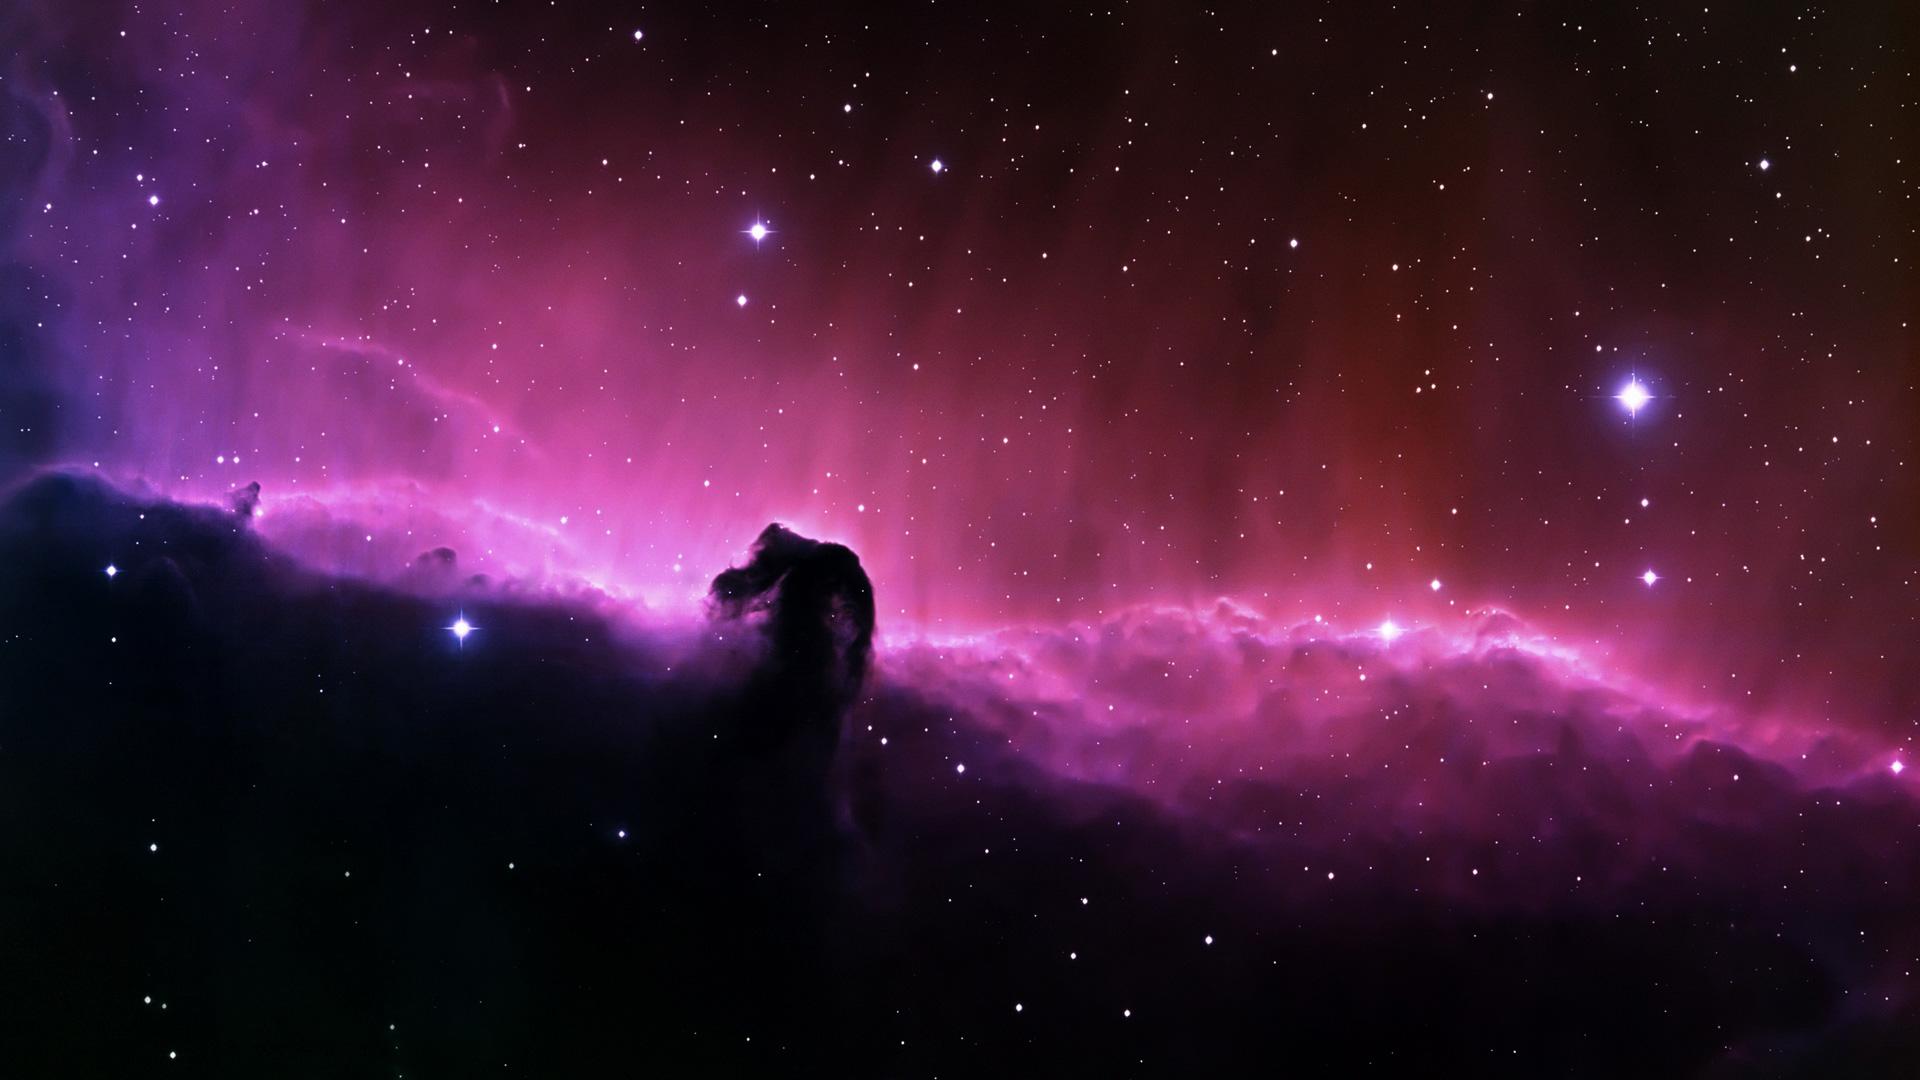 Download Wallpaper Horse Nebula - tumblr_static_2evlucjhqujo0okwk4csog0ck  Best Photo Reference_42736.jpg